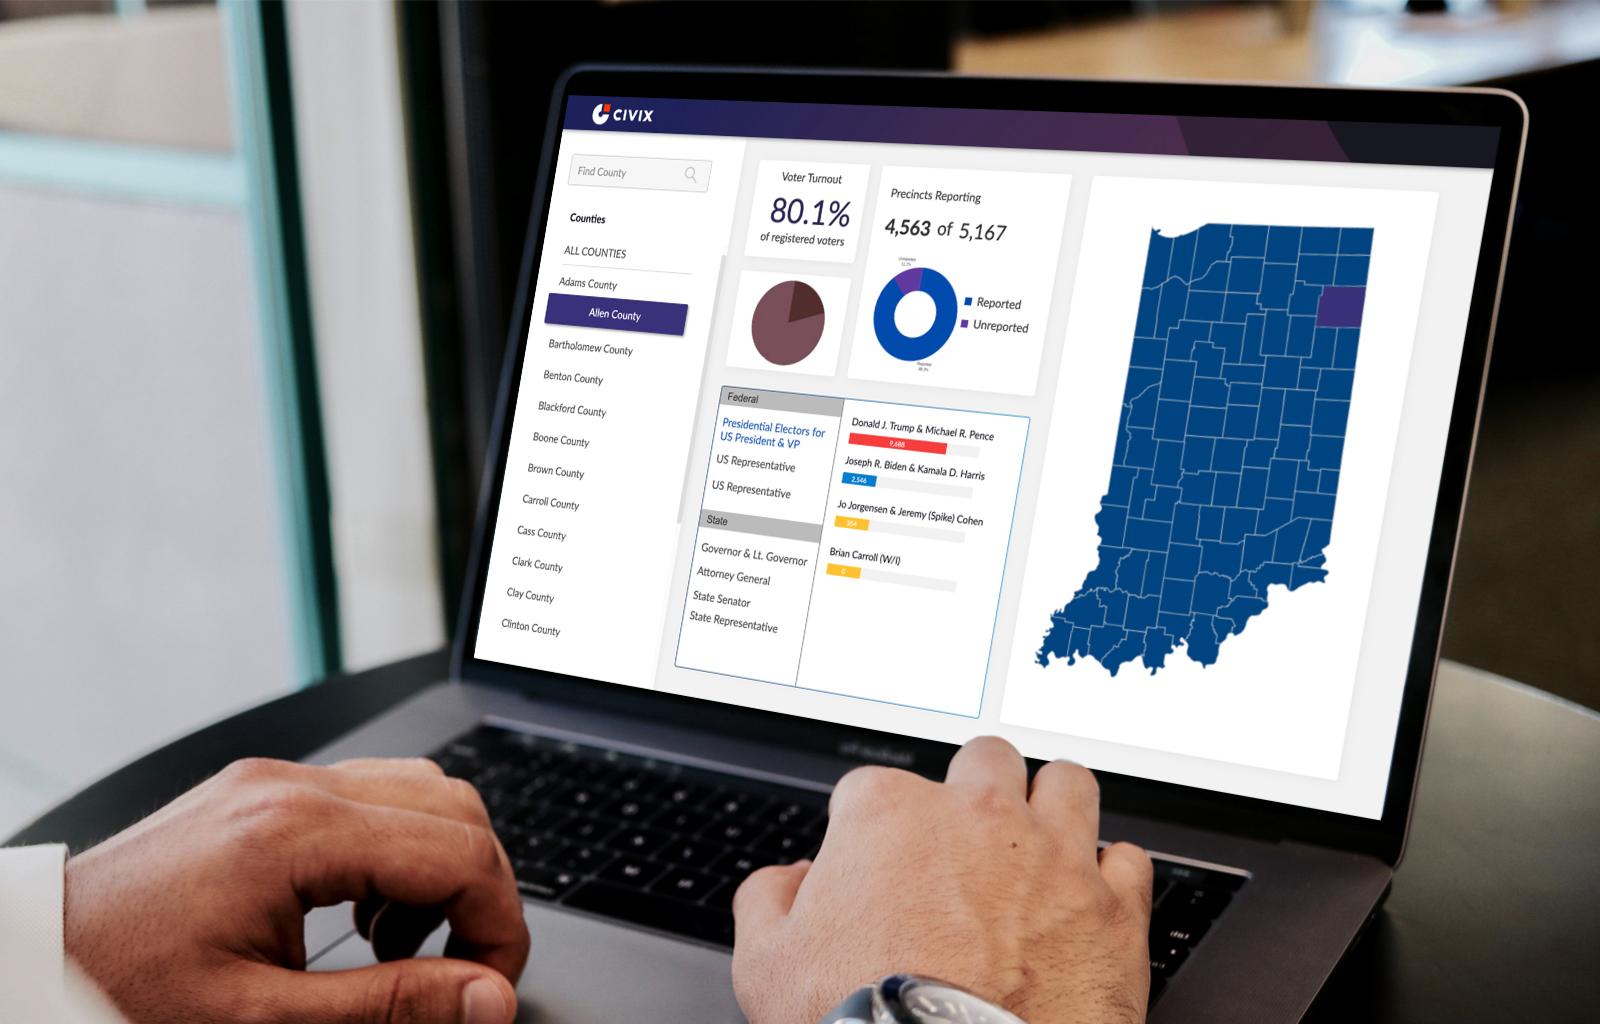 Laptop displaying Civix election management software